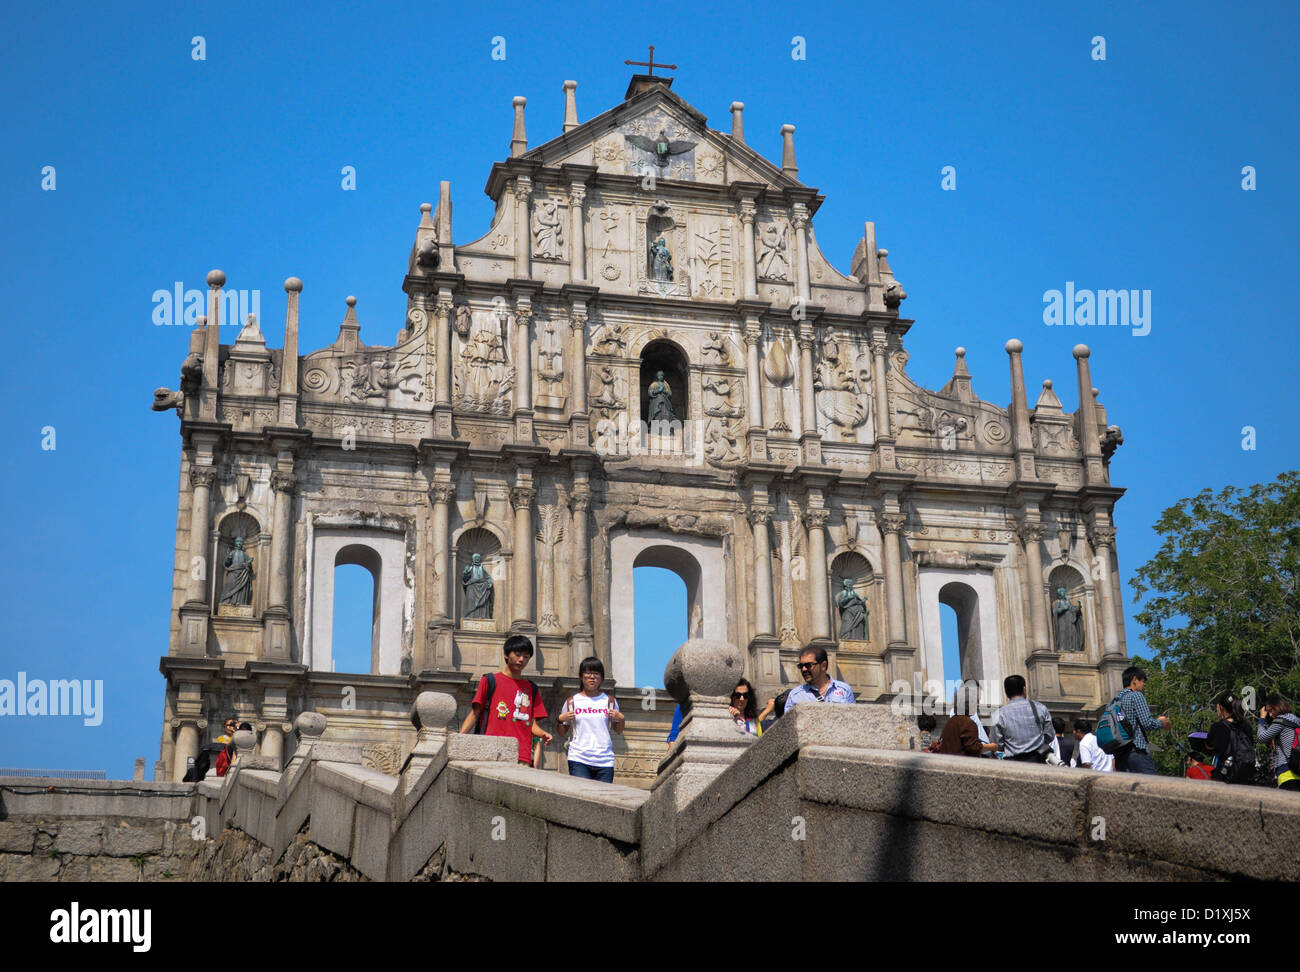 San Paolo rovine, icona di Macau Immagini Stock